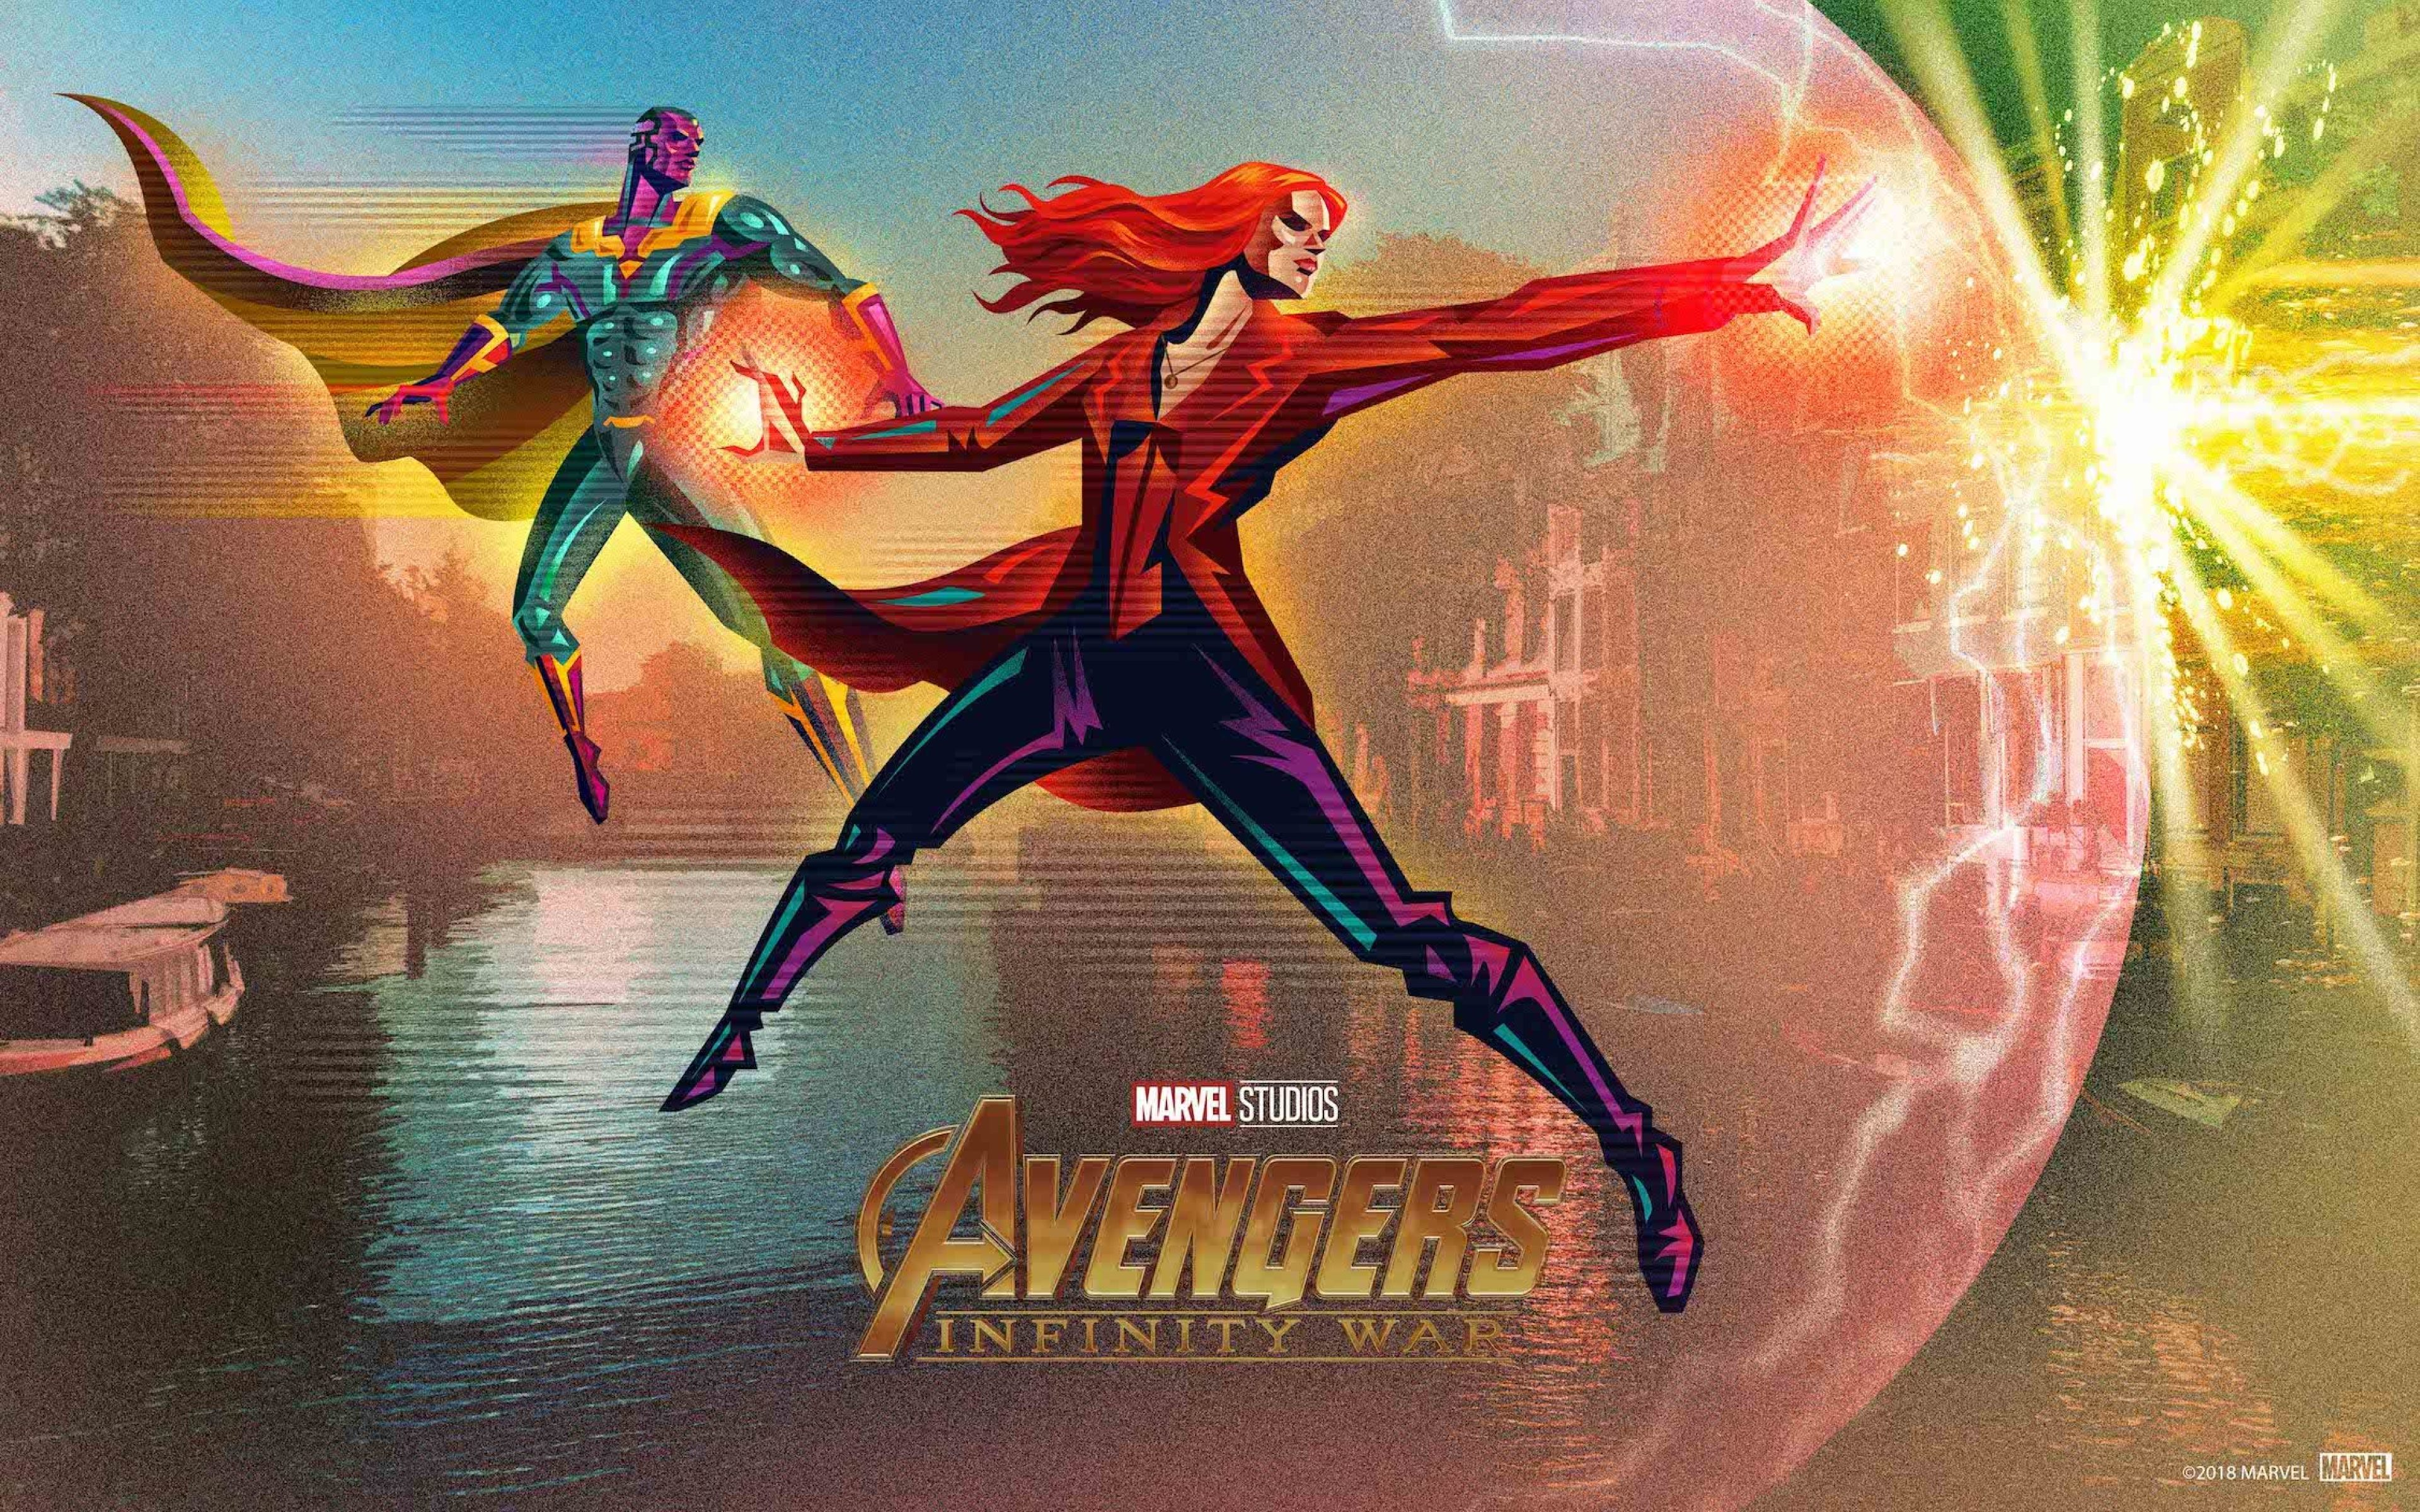 Download Fandango Avengers Infinity War Posters 3840x2400 Resolution